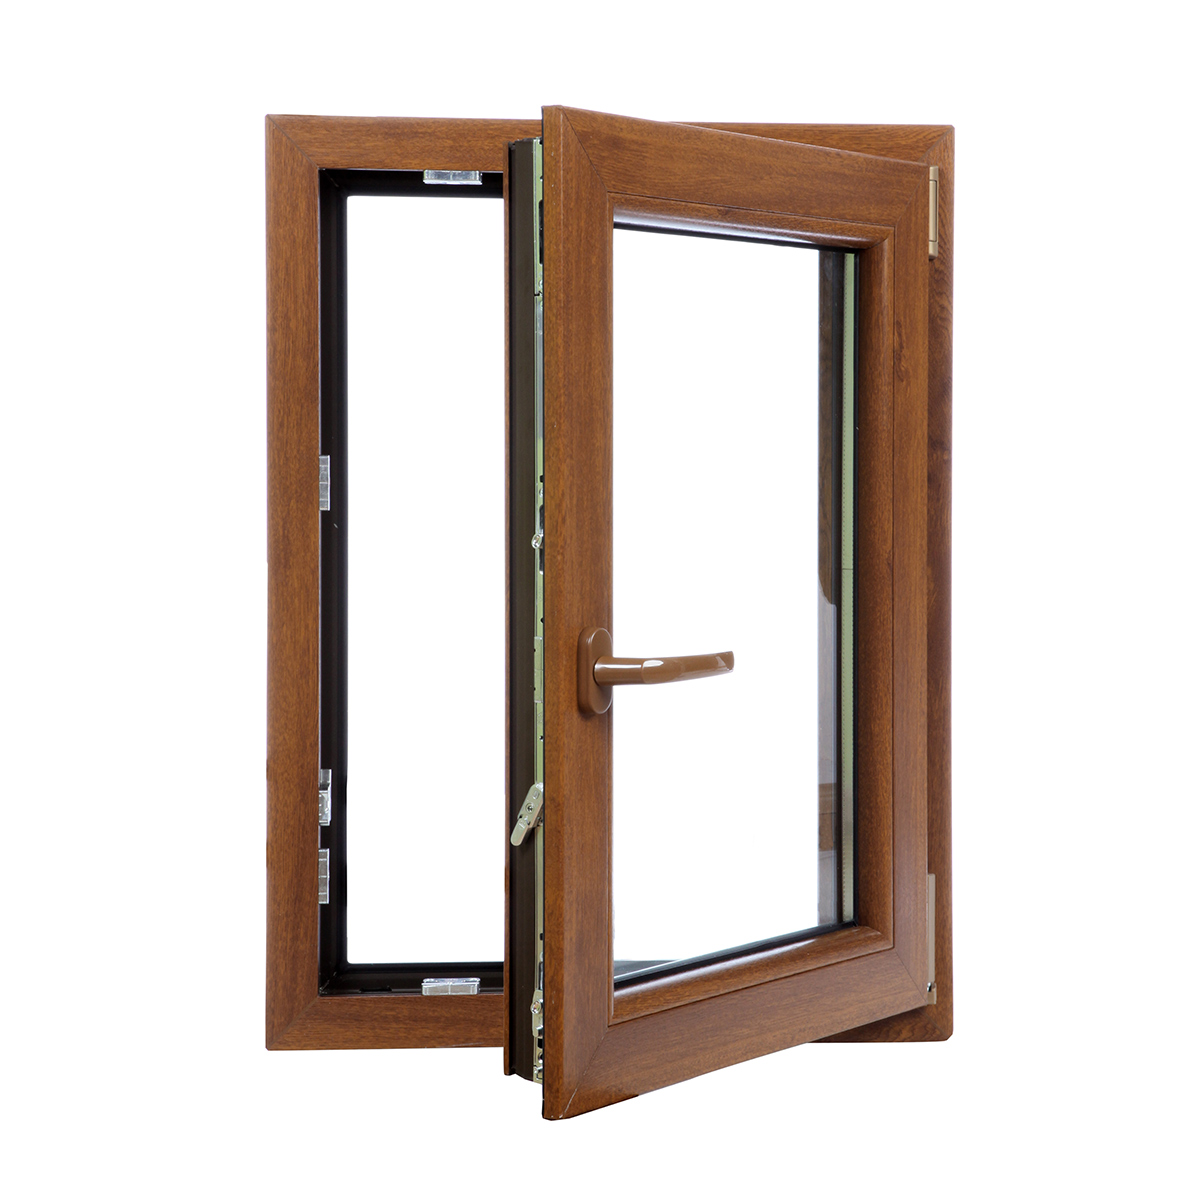 Upvc tilt turn frosted glass pvc double glazed window for Pvc double glazing